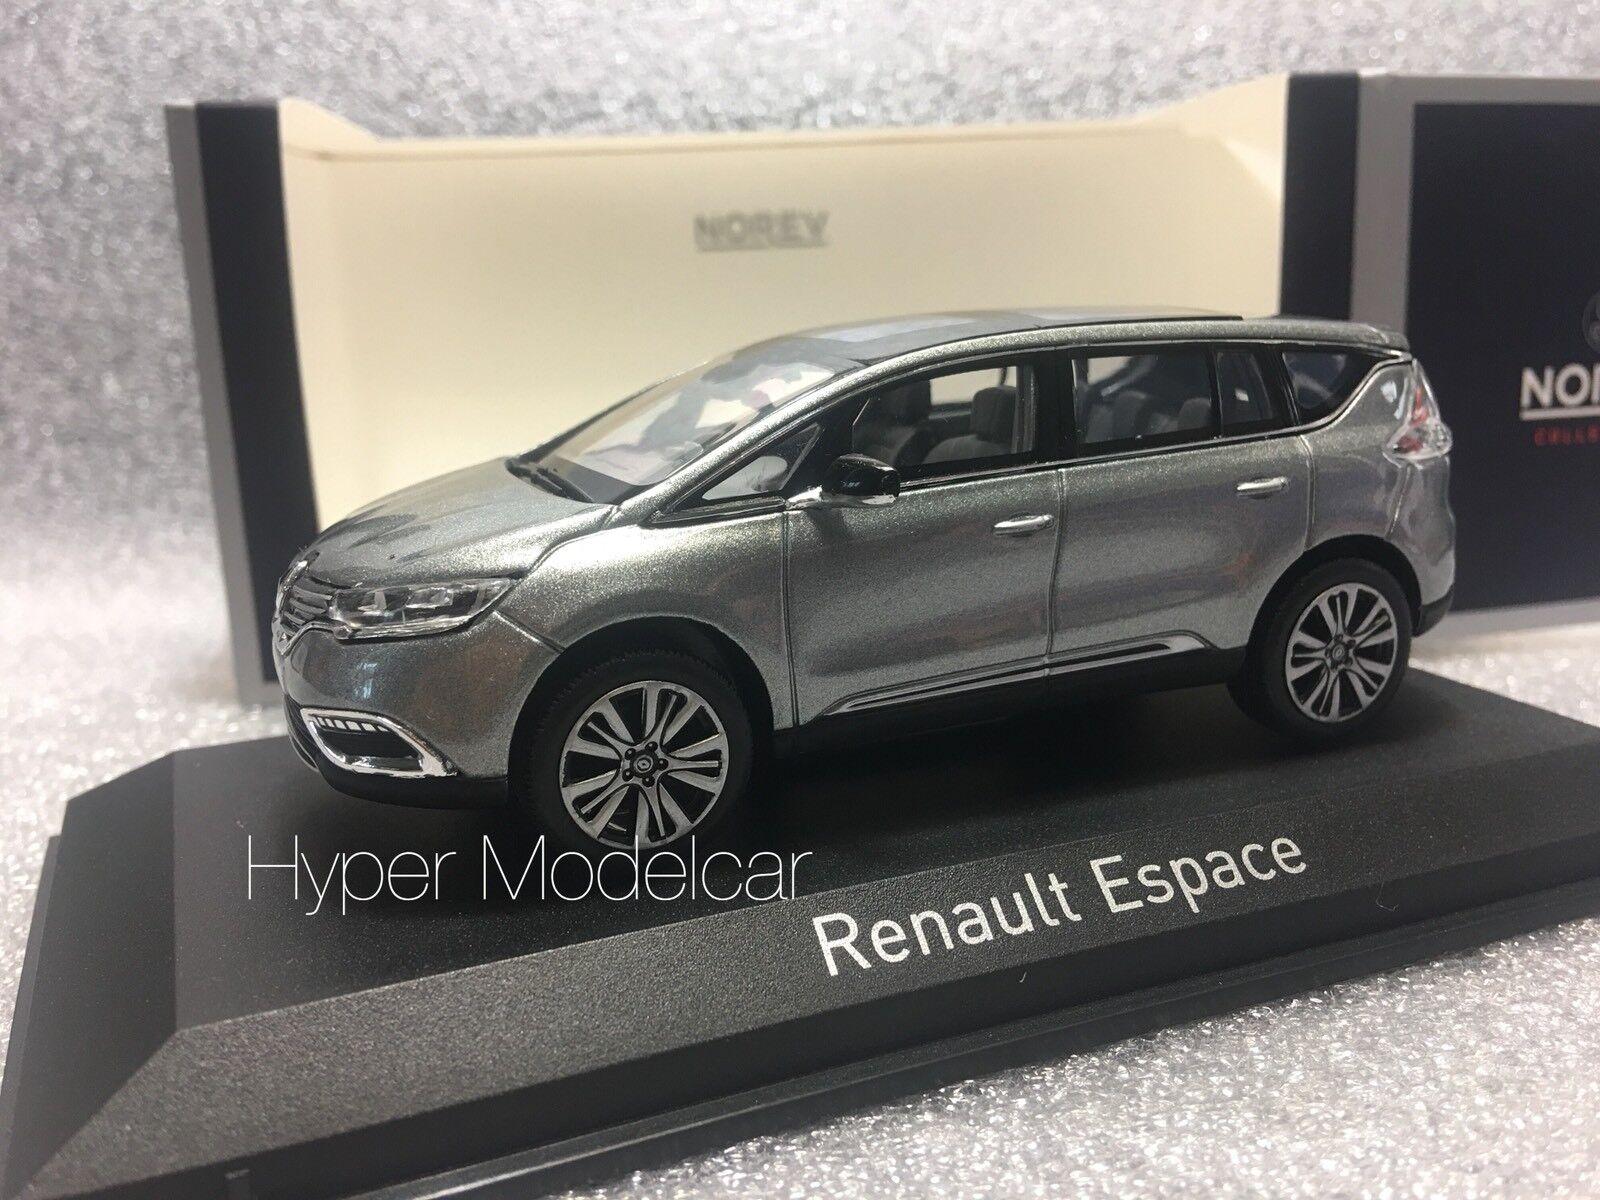 NOREV 1 43 Renault Espace Initiale Paris 2015 Grey Grey Grey Met. Art. 517944 257227